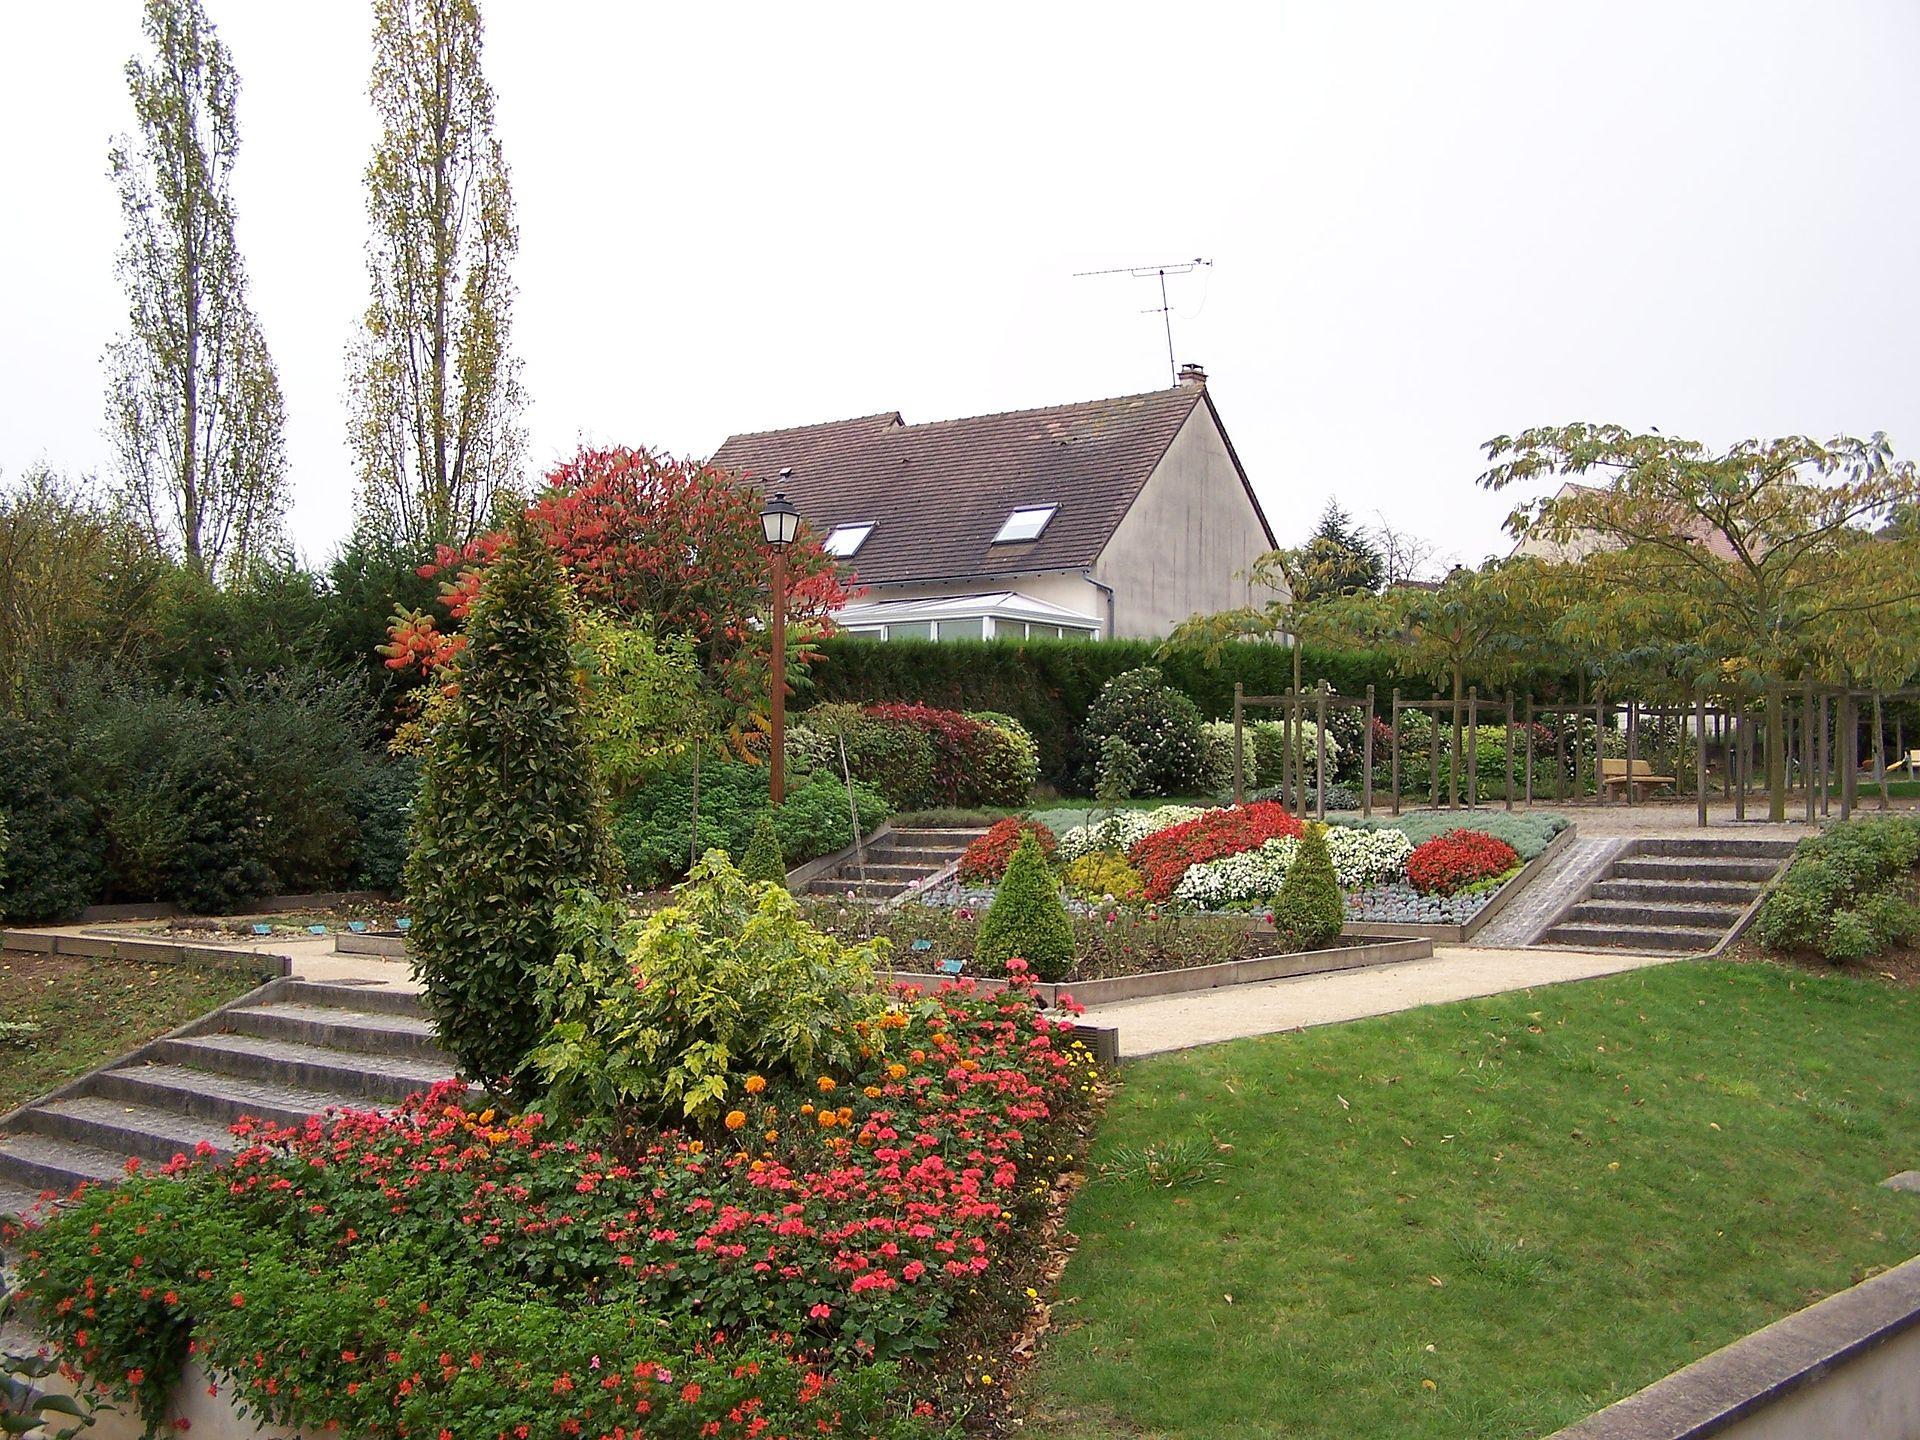 Jardin des cinq sens wikip dia for Jardin 44 des 5 sens